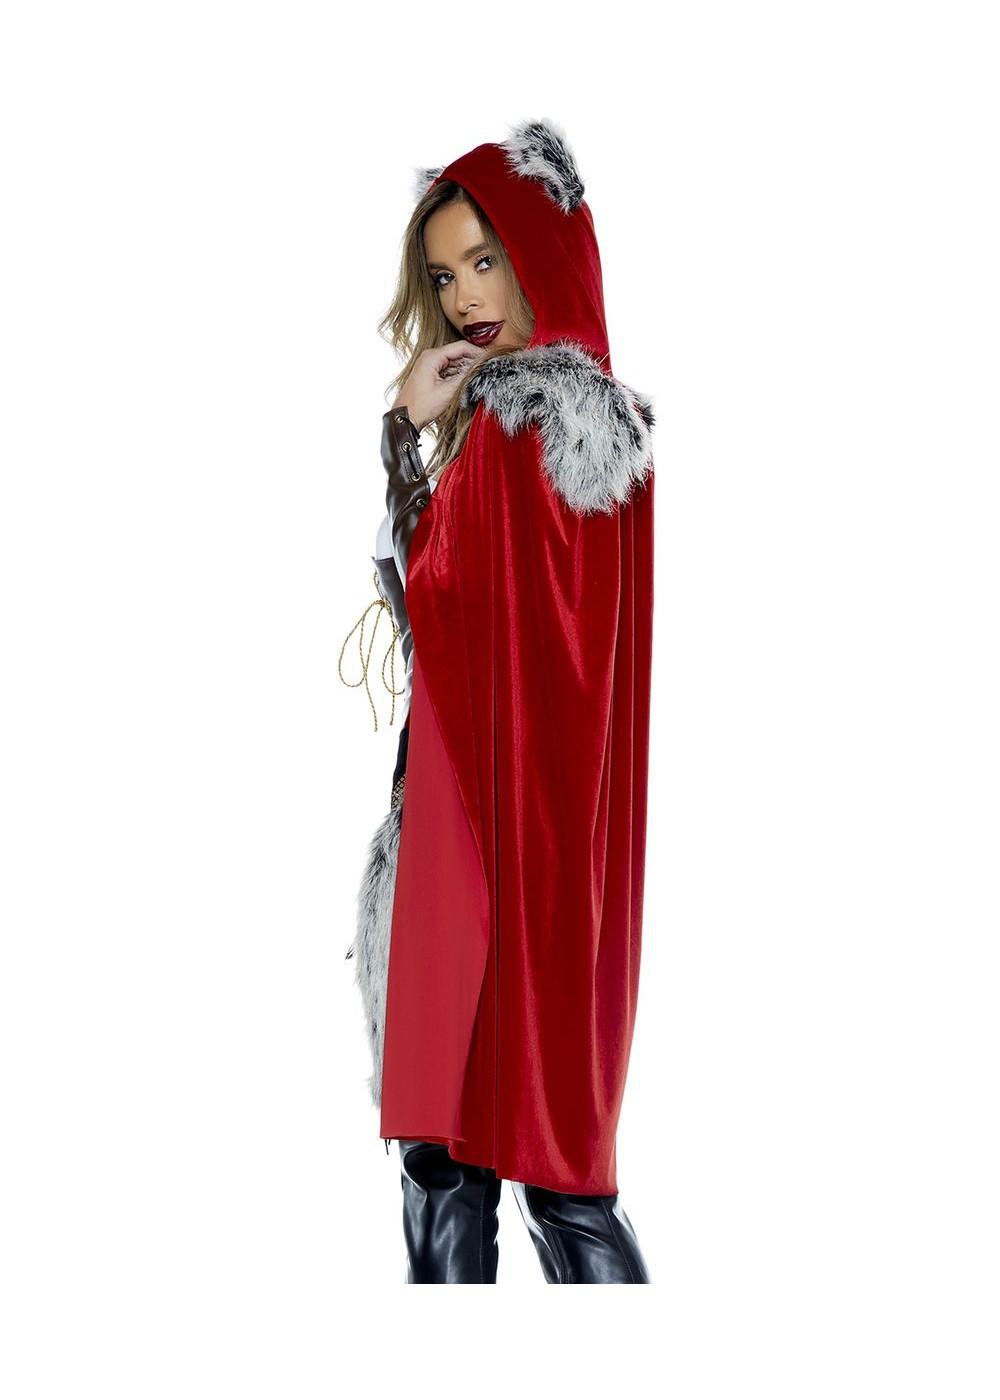 Halloween Makeup For Little Red Riding Hood